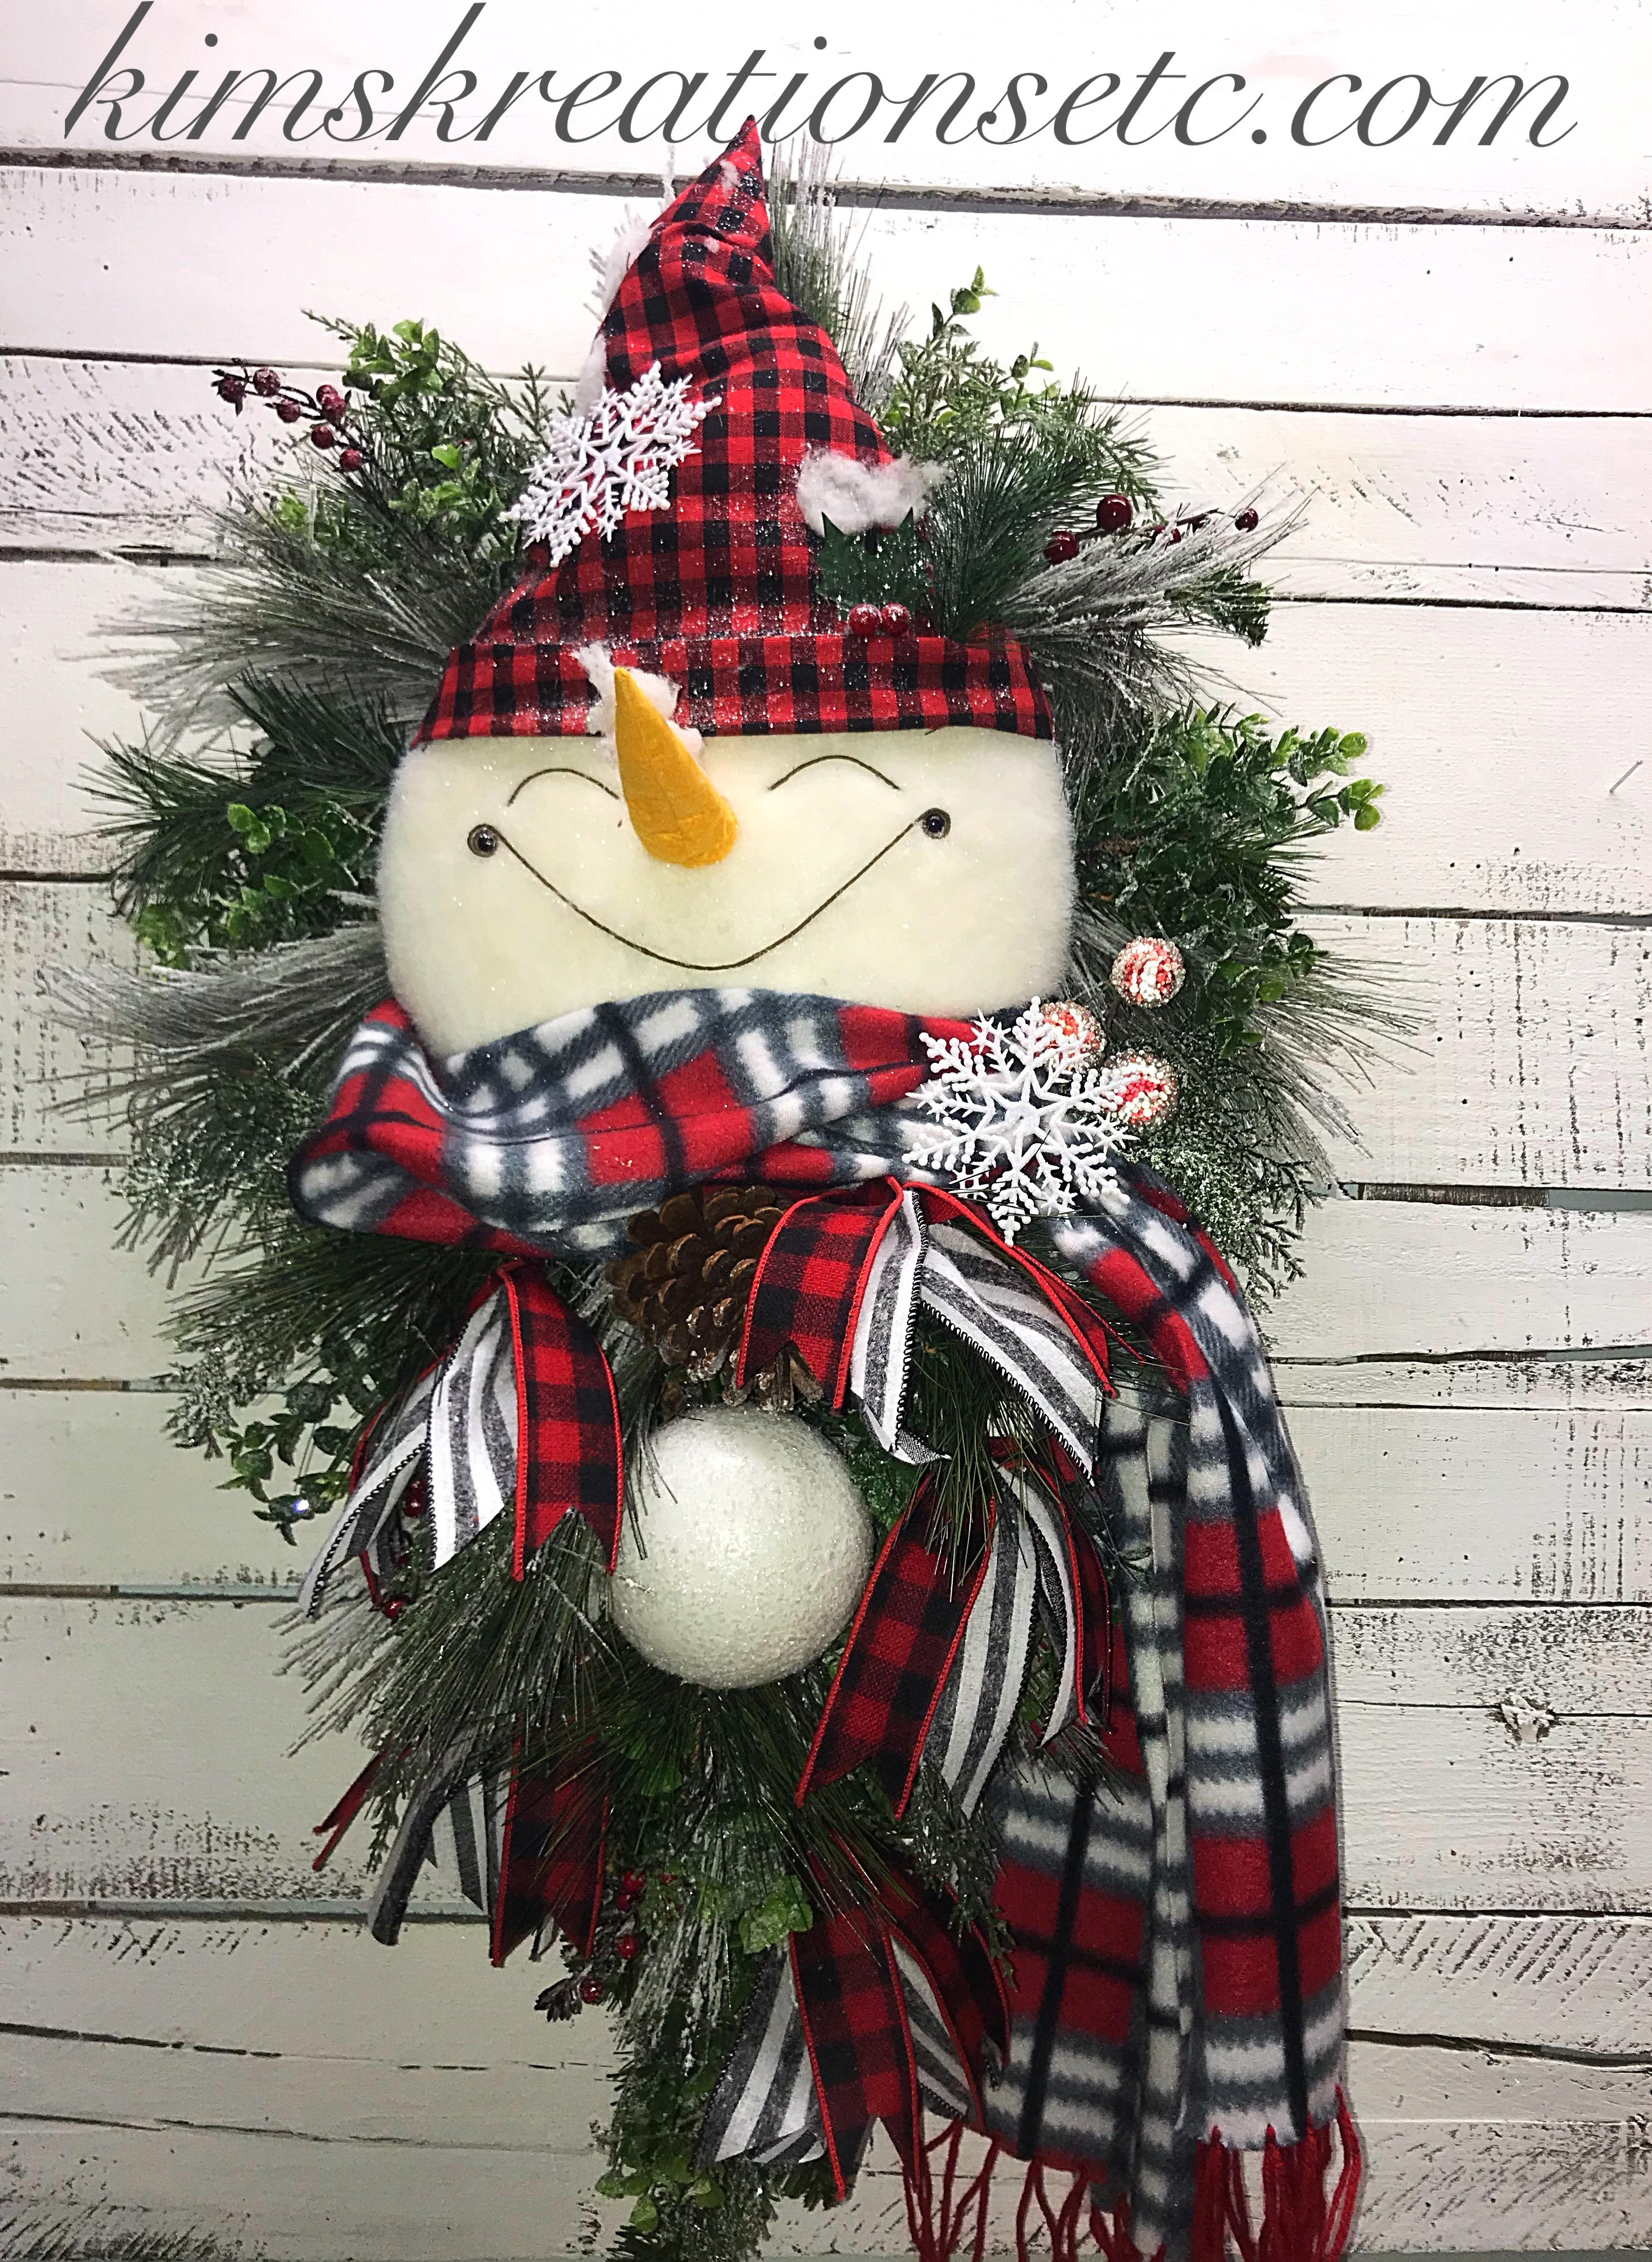 Winter Wreath Snowman Wreath Front Door Swag Winter Decor Snowman Swag For Front Door Buffalo Plaid Snowman Winter Plaid Snowman Home Decor Handmade Wreaths Wreaths For Sale Kim S Kreations Etc